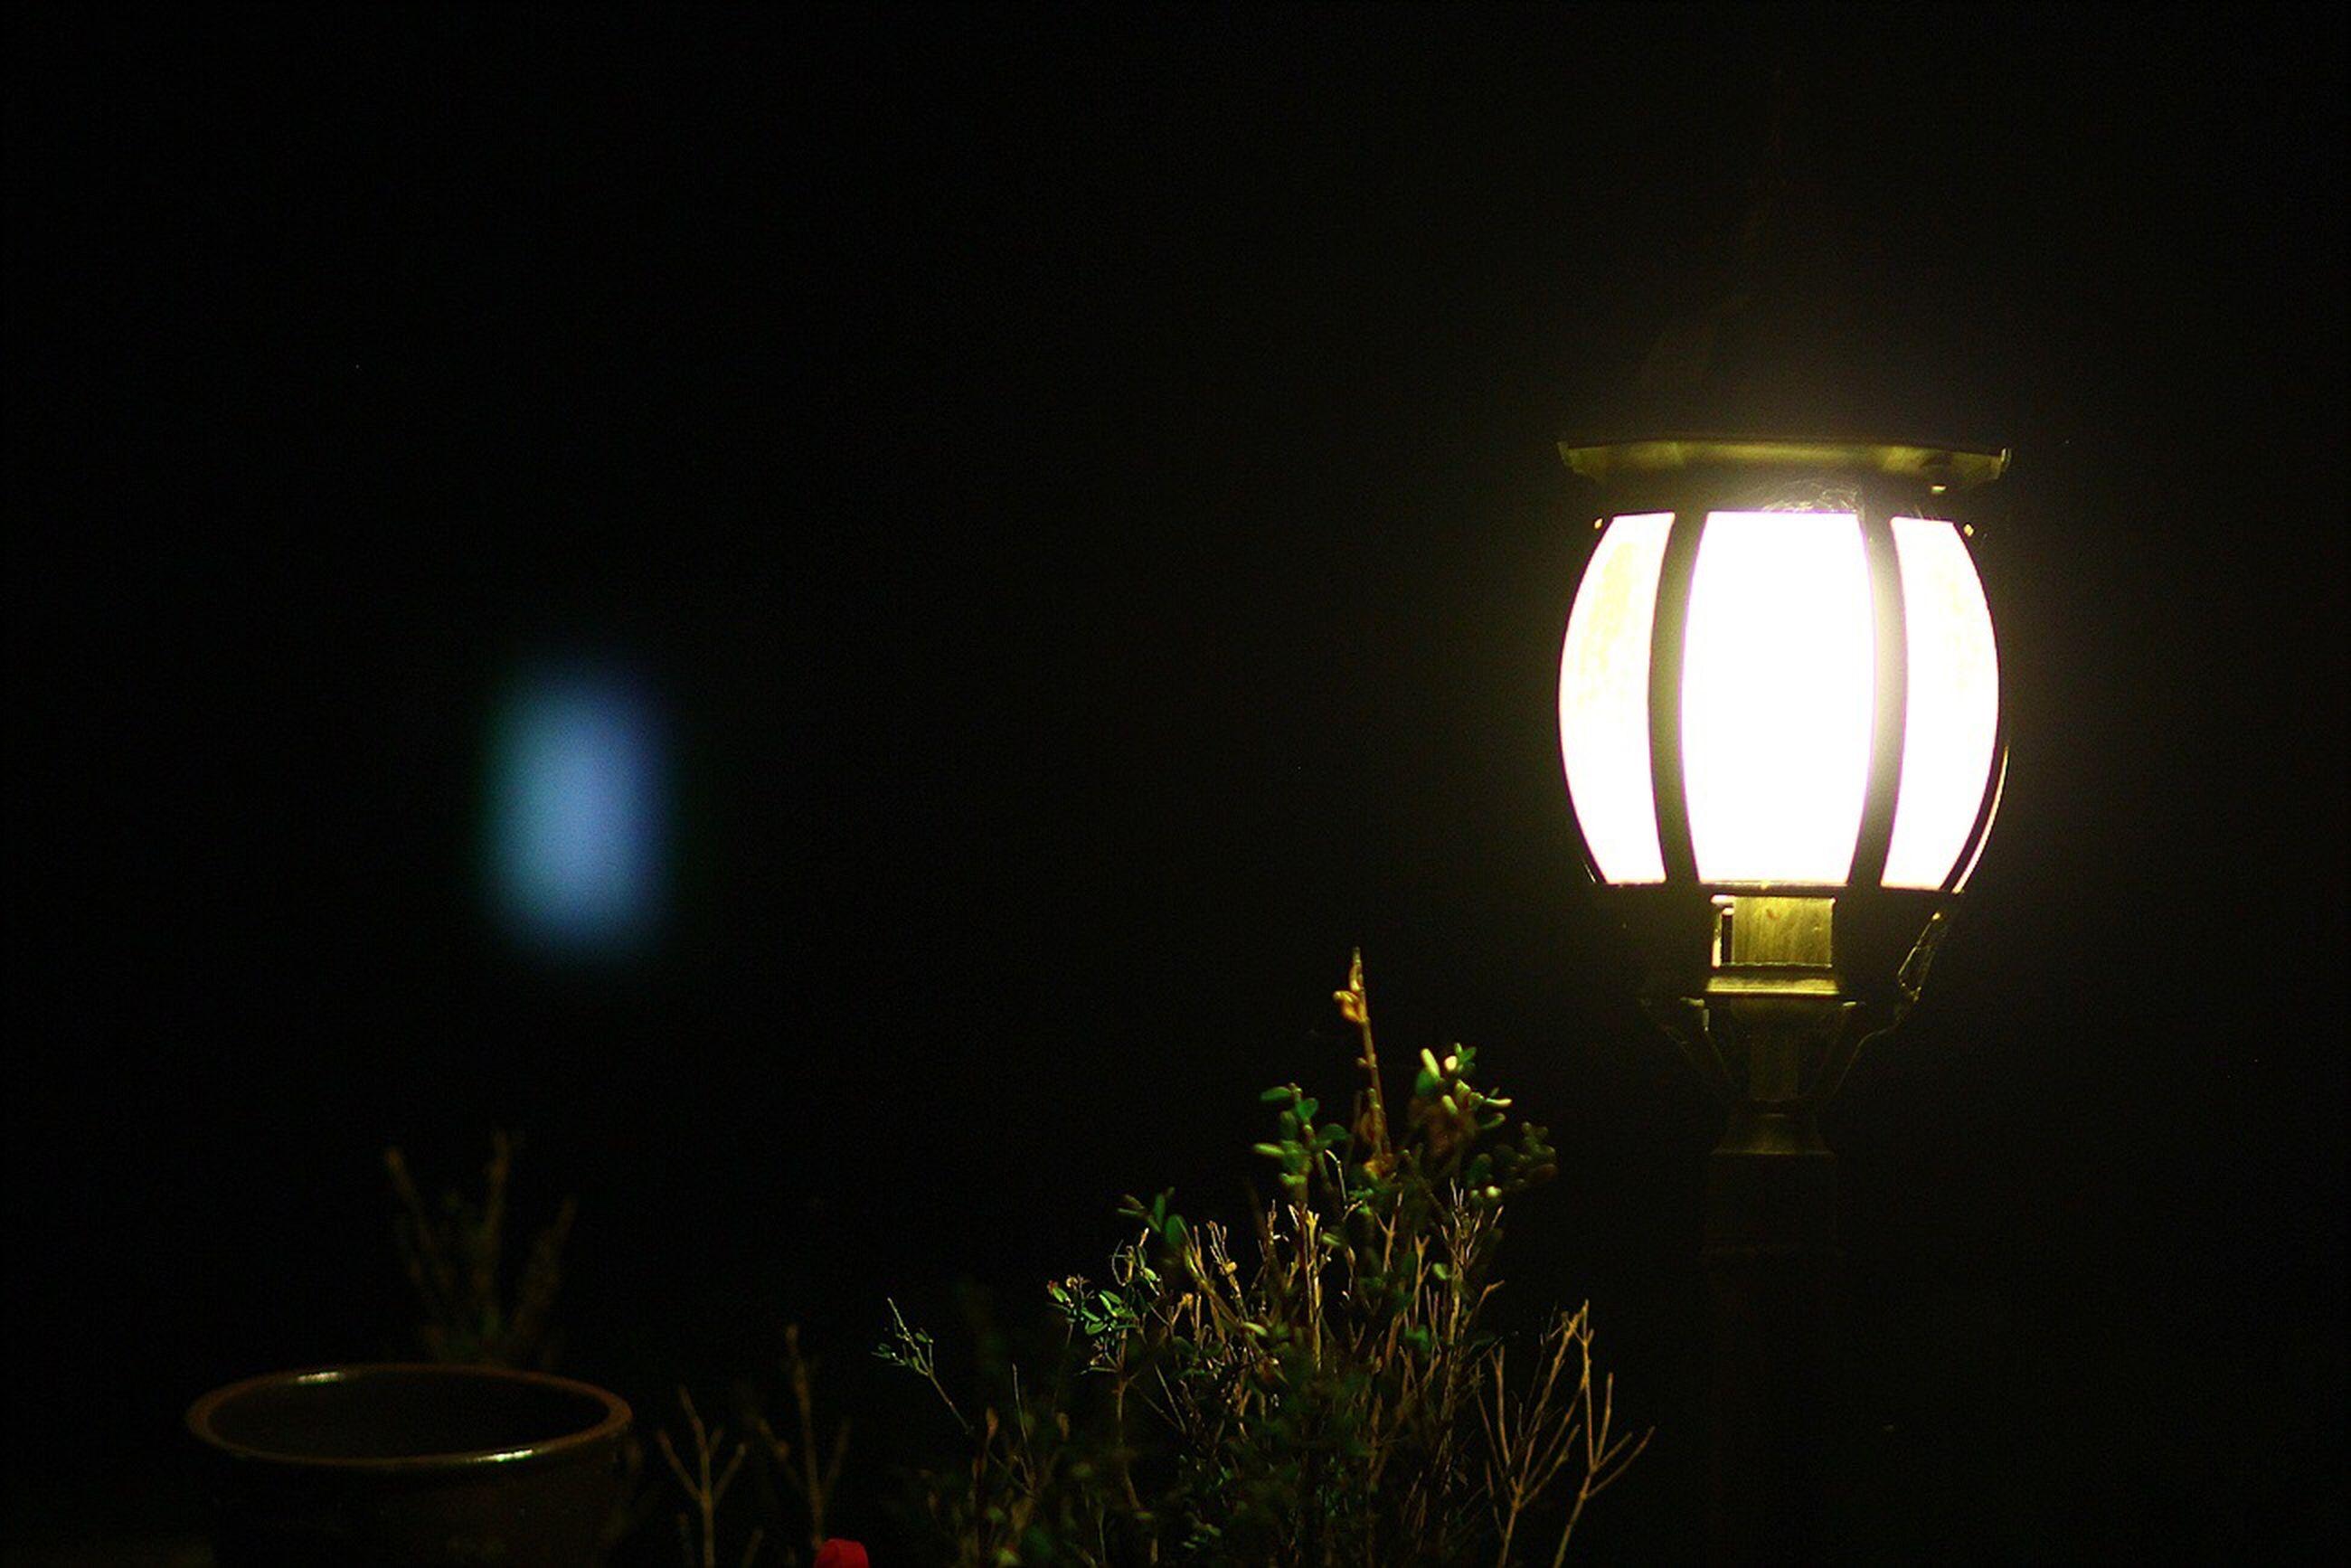 illuminated, lighting equipment, electric light, no people, tranquility